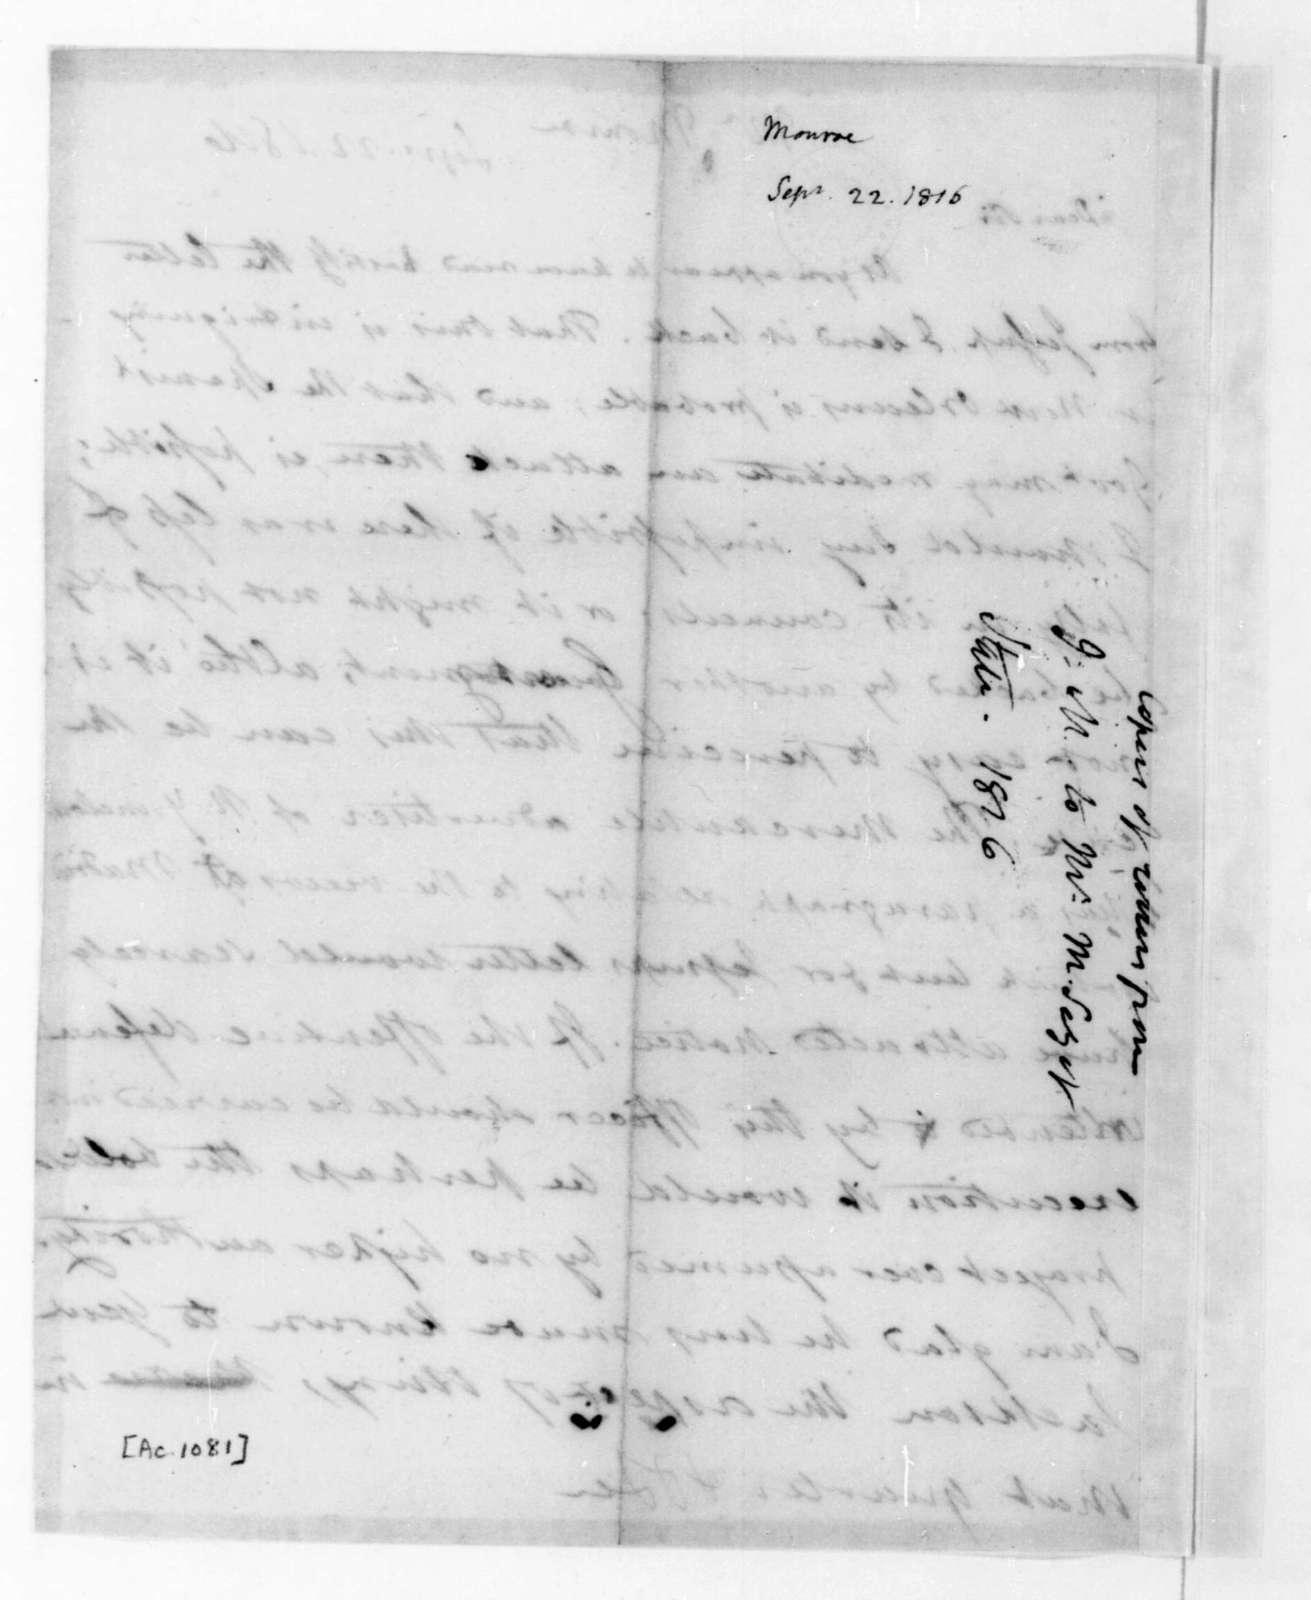 James Madison to James Monroe, September 22, 1816.